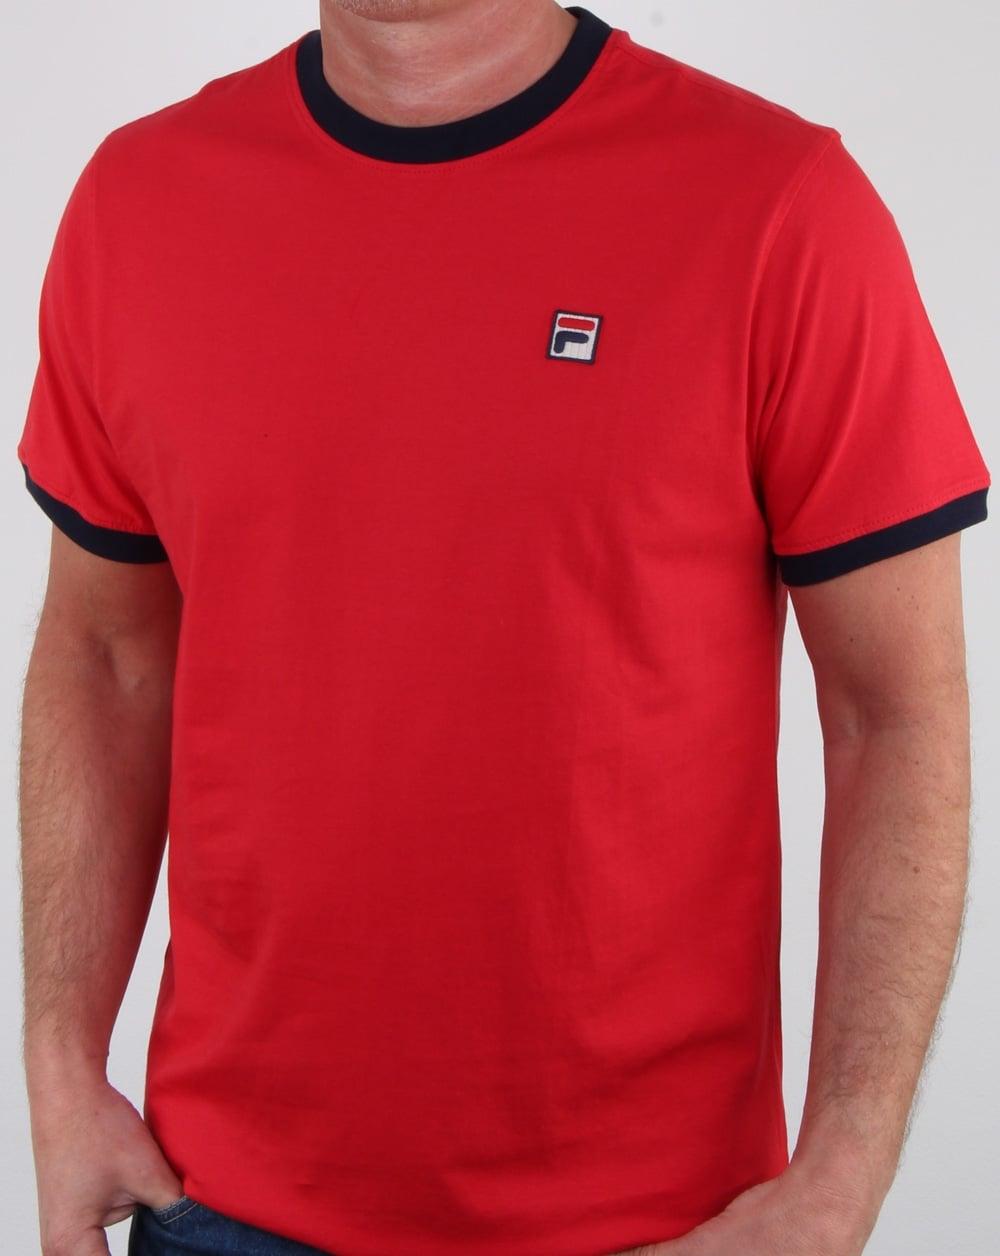 4d0e82b85264 Fila Vintage Fila Vintage Marconi T Shirt Red navy